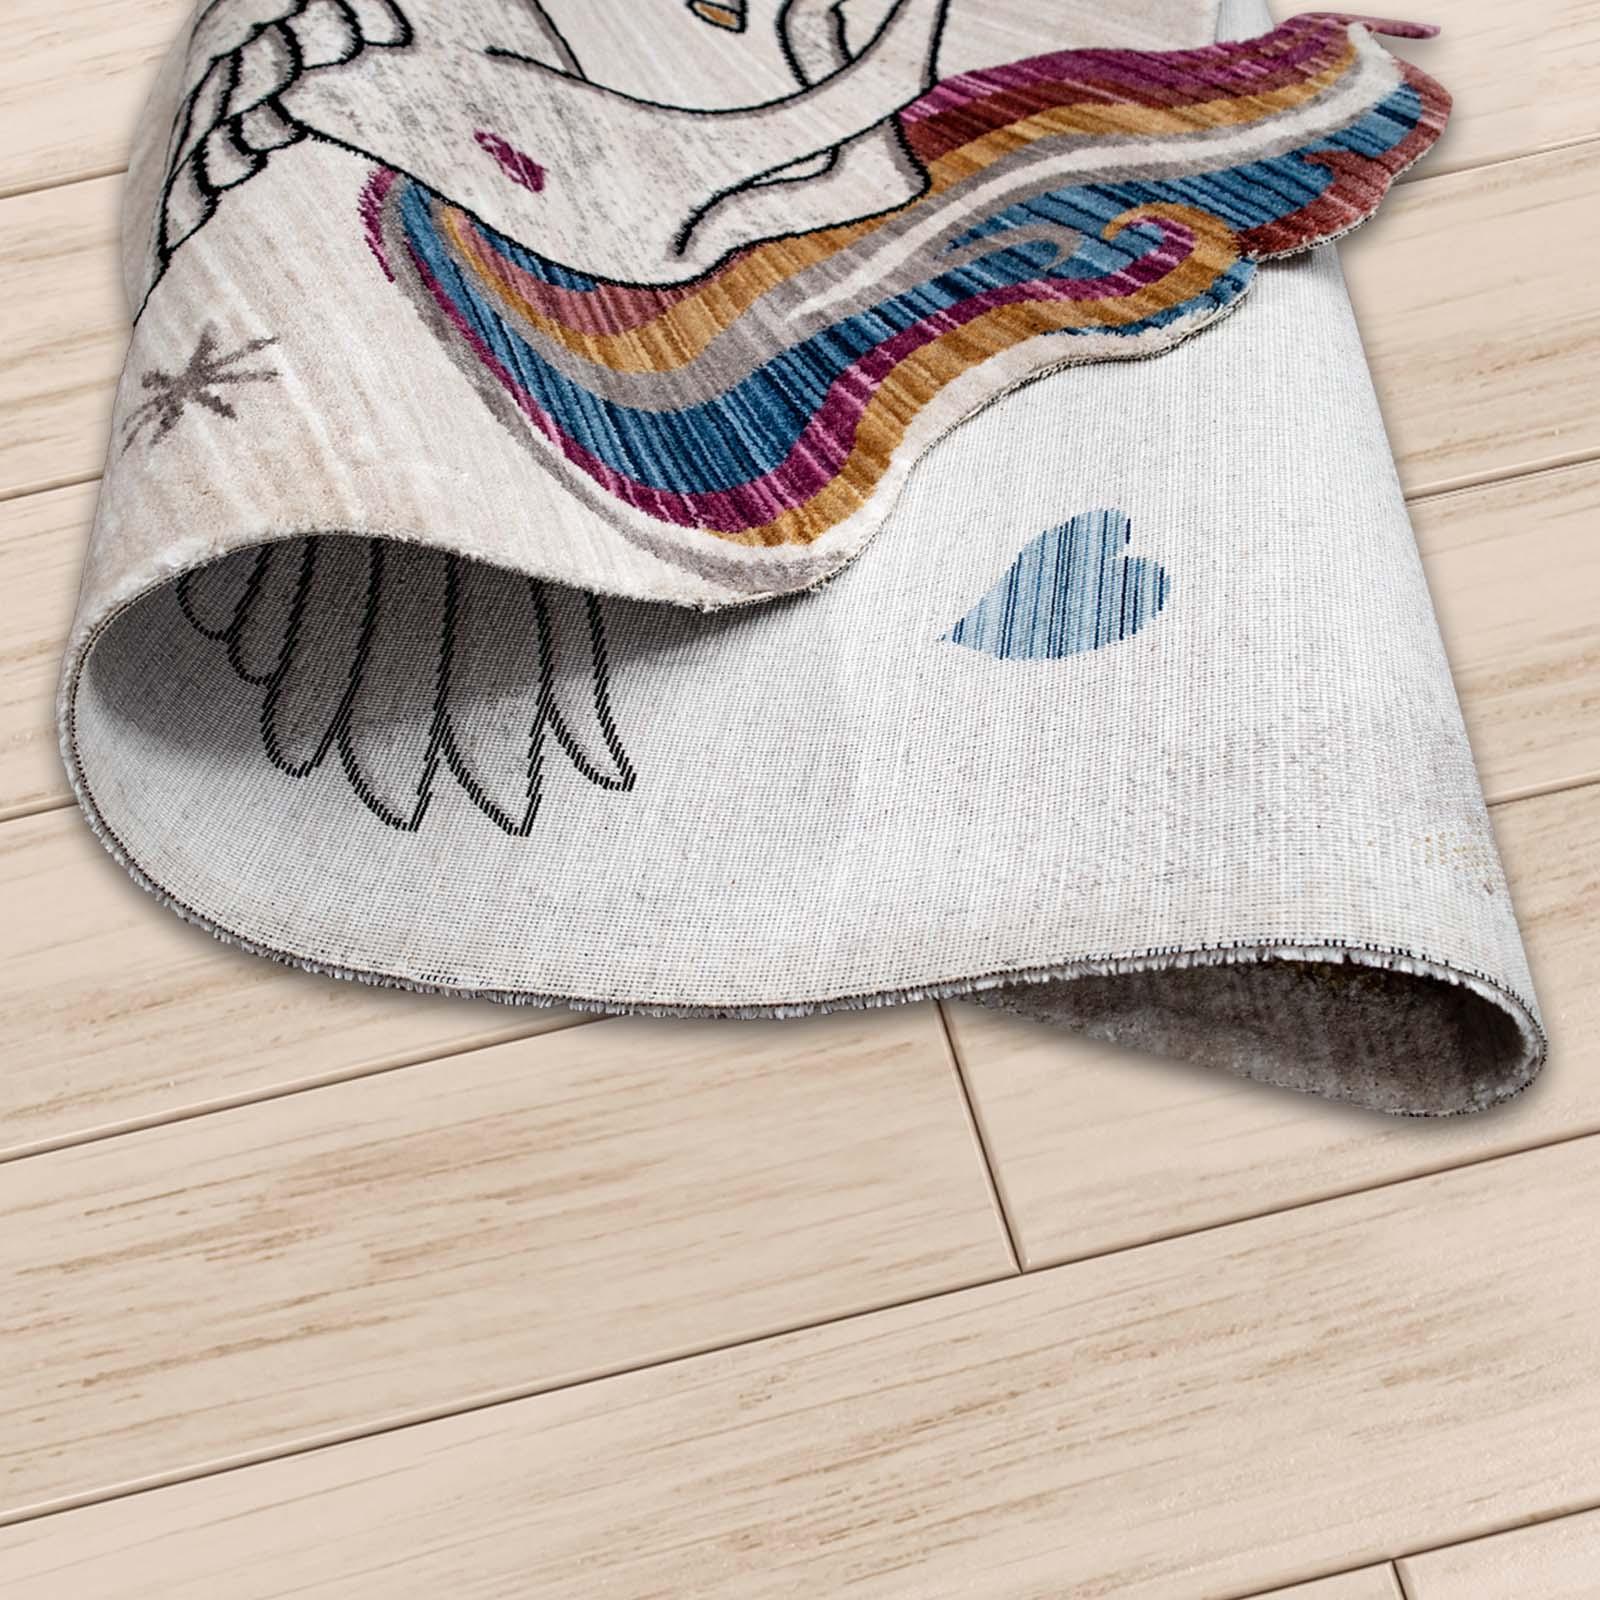 Angora Home Kids Unicorn Desenli Pembe Çocuk Halısı - 4